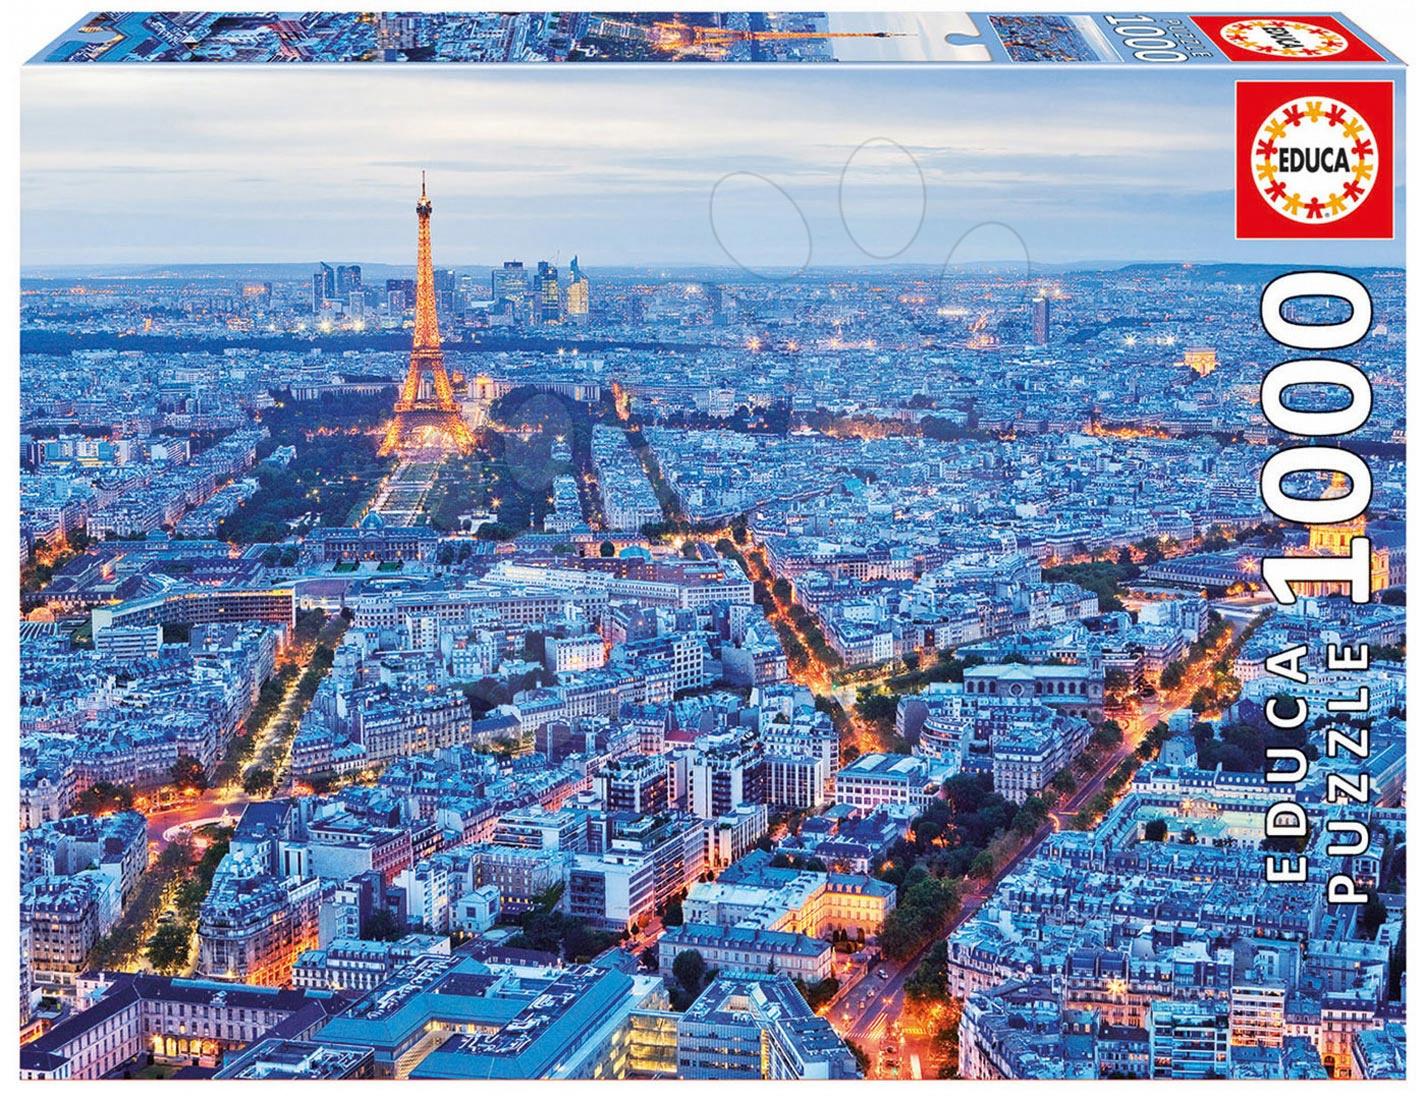 Puzzle 1000 dielne - Puzzle Genuine Paris Lights Educa 1000 dielov od 12 rokov